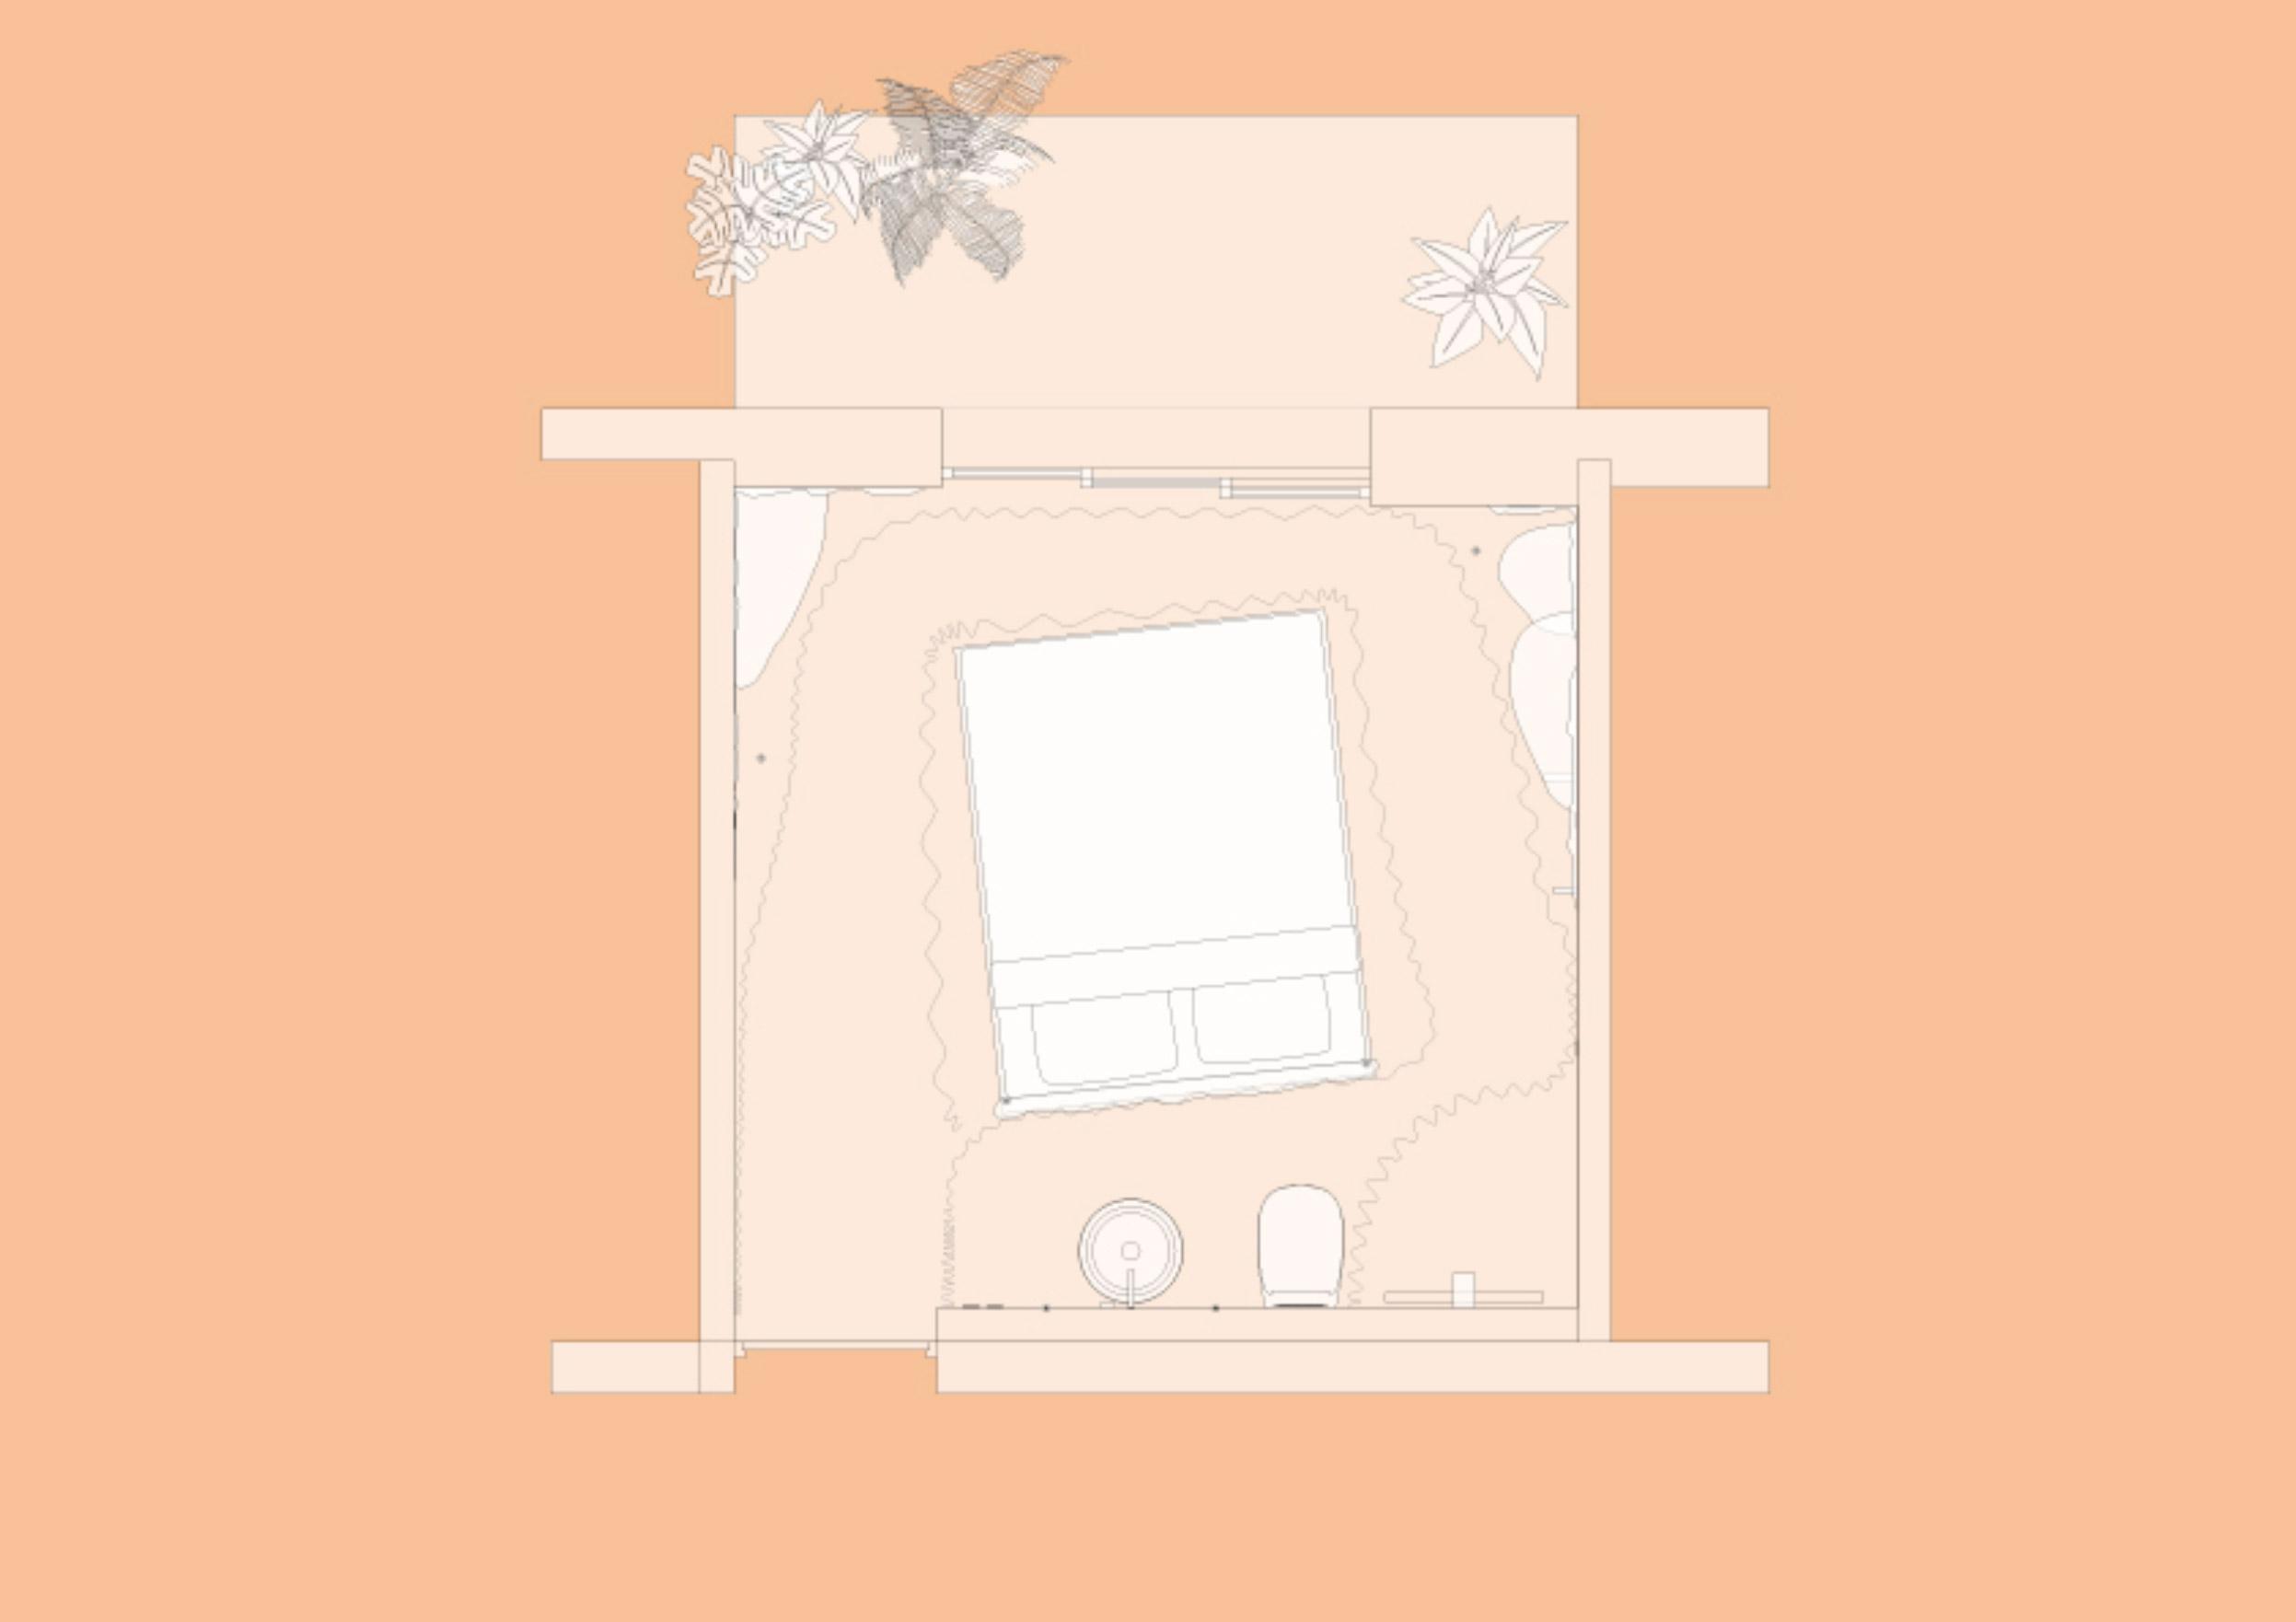 odd matter plan chambre